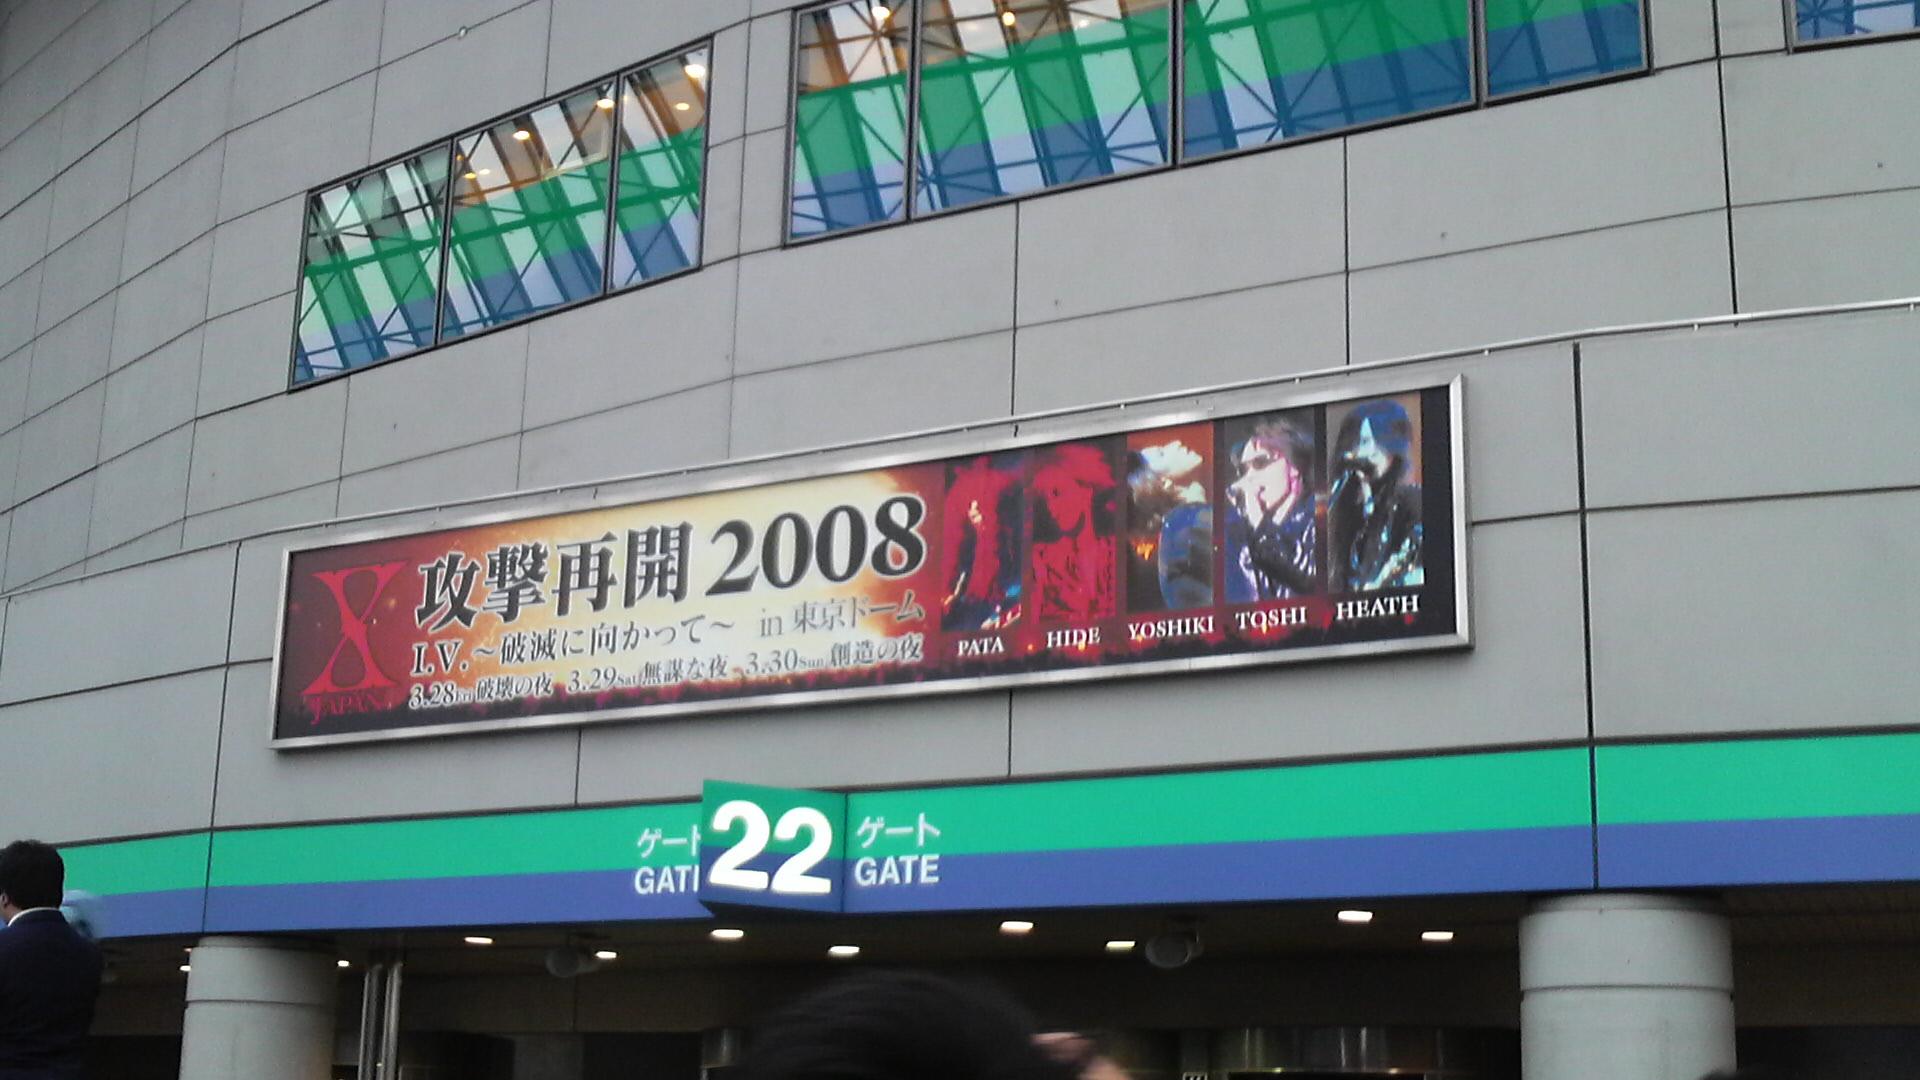 P1000023.JPG